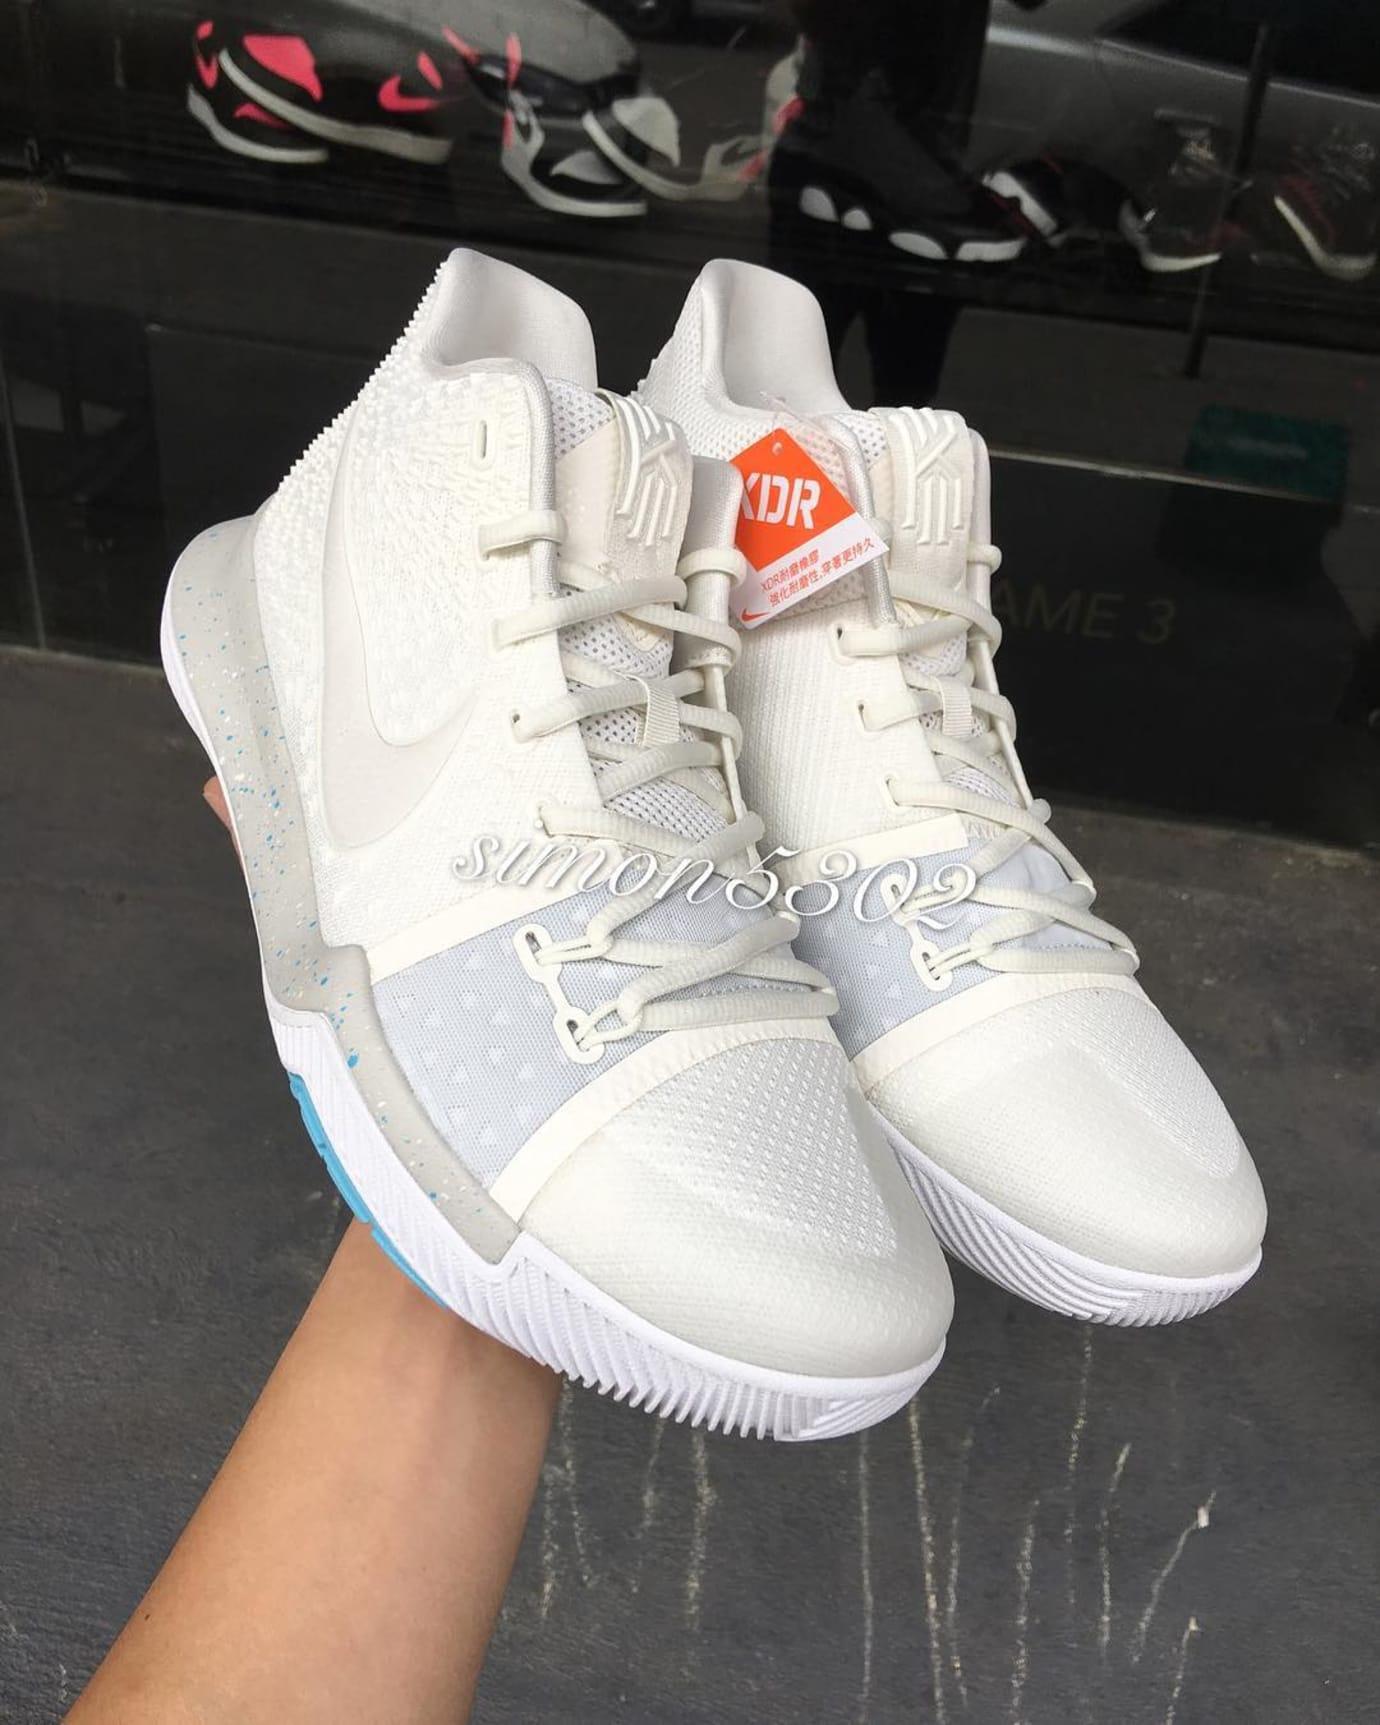 34b3b3d9600c Nike Kyrie 3 Ivory Release Date 852395-101 (7)